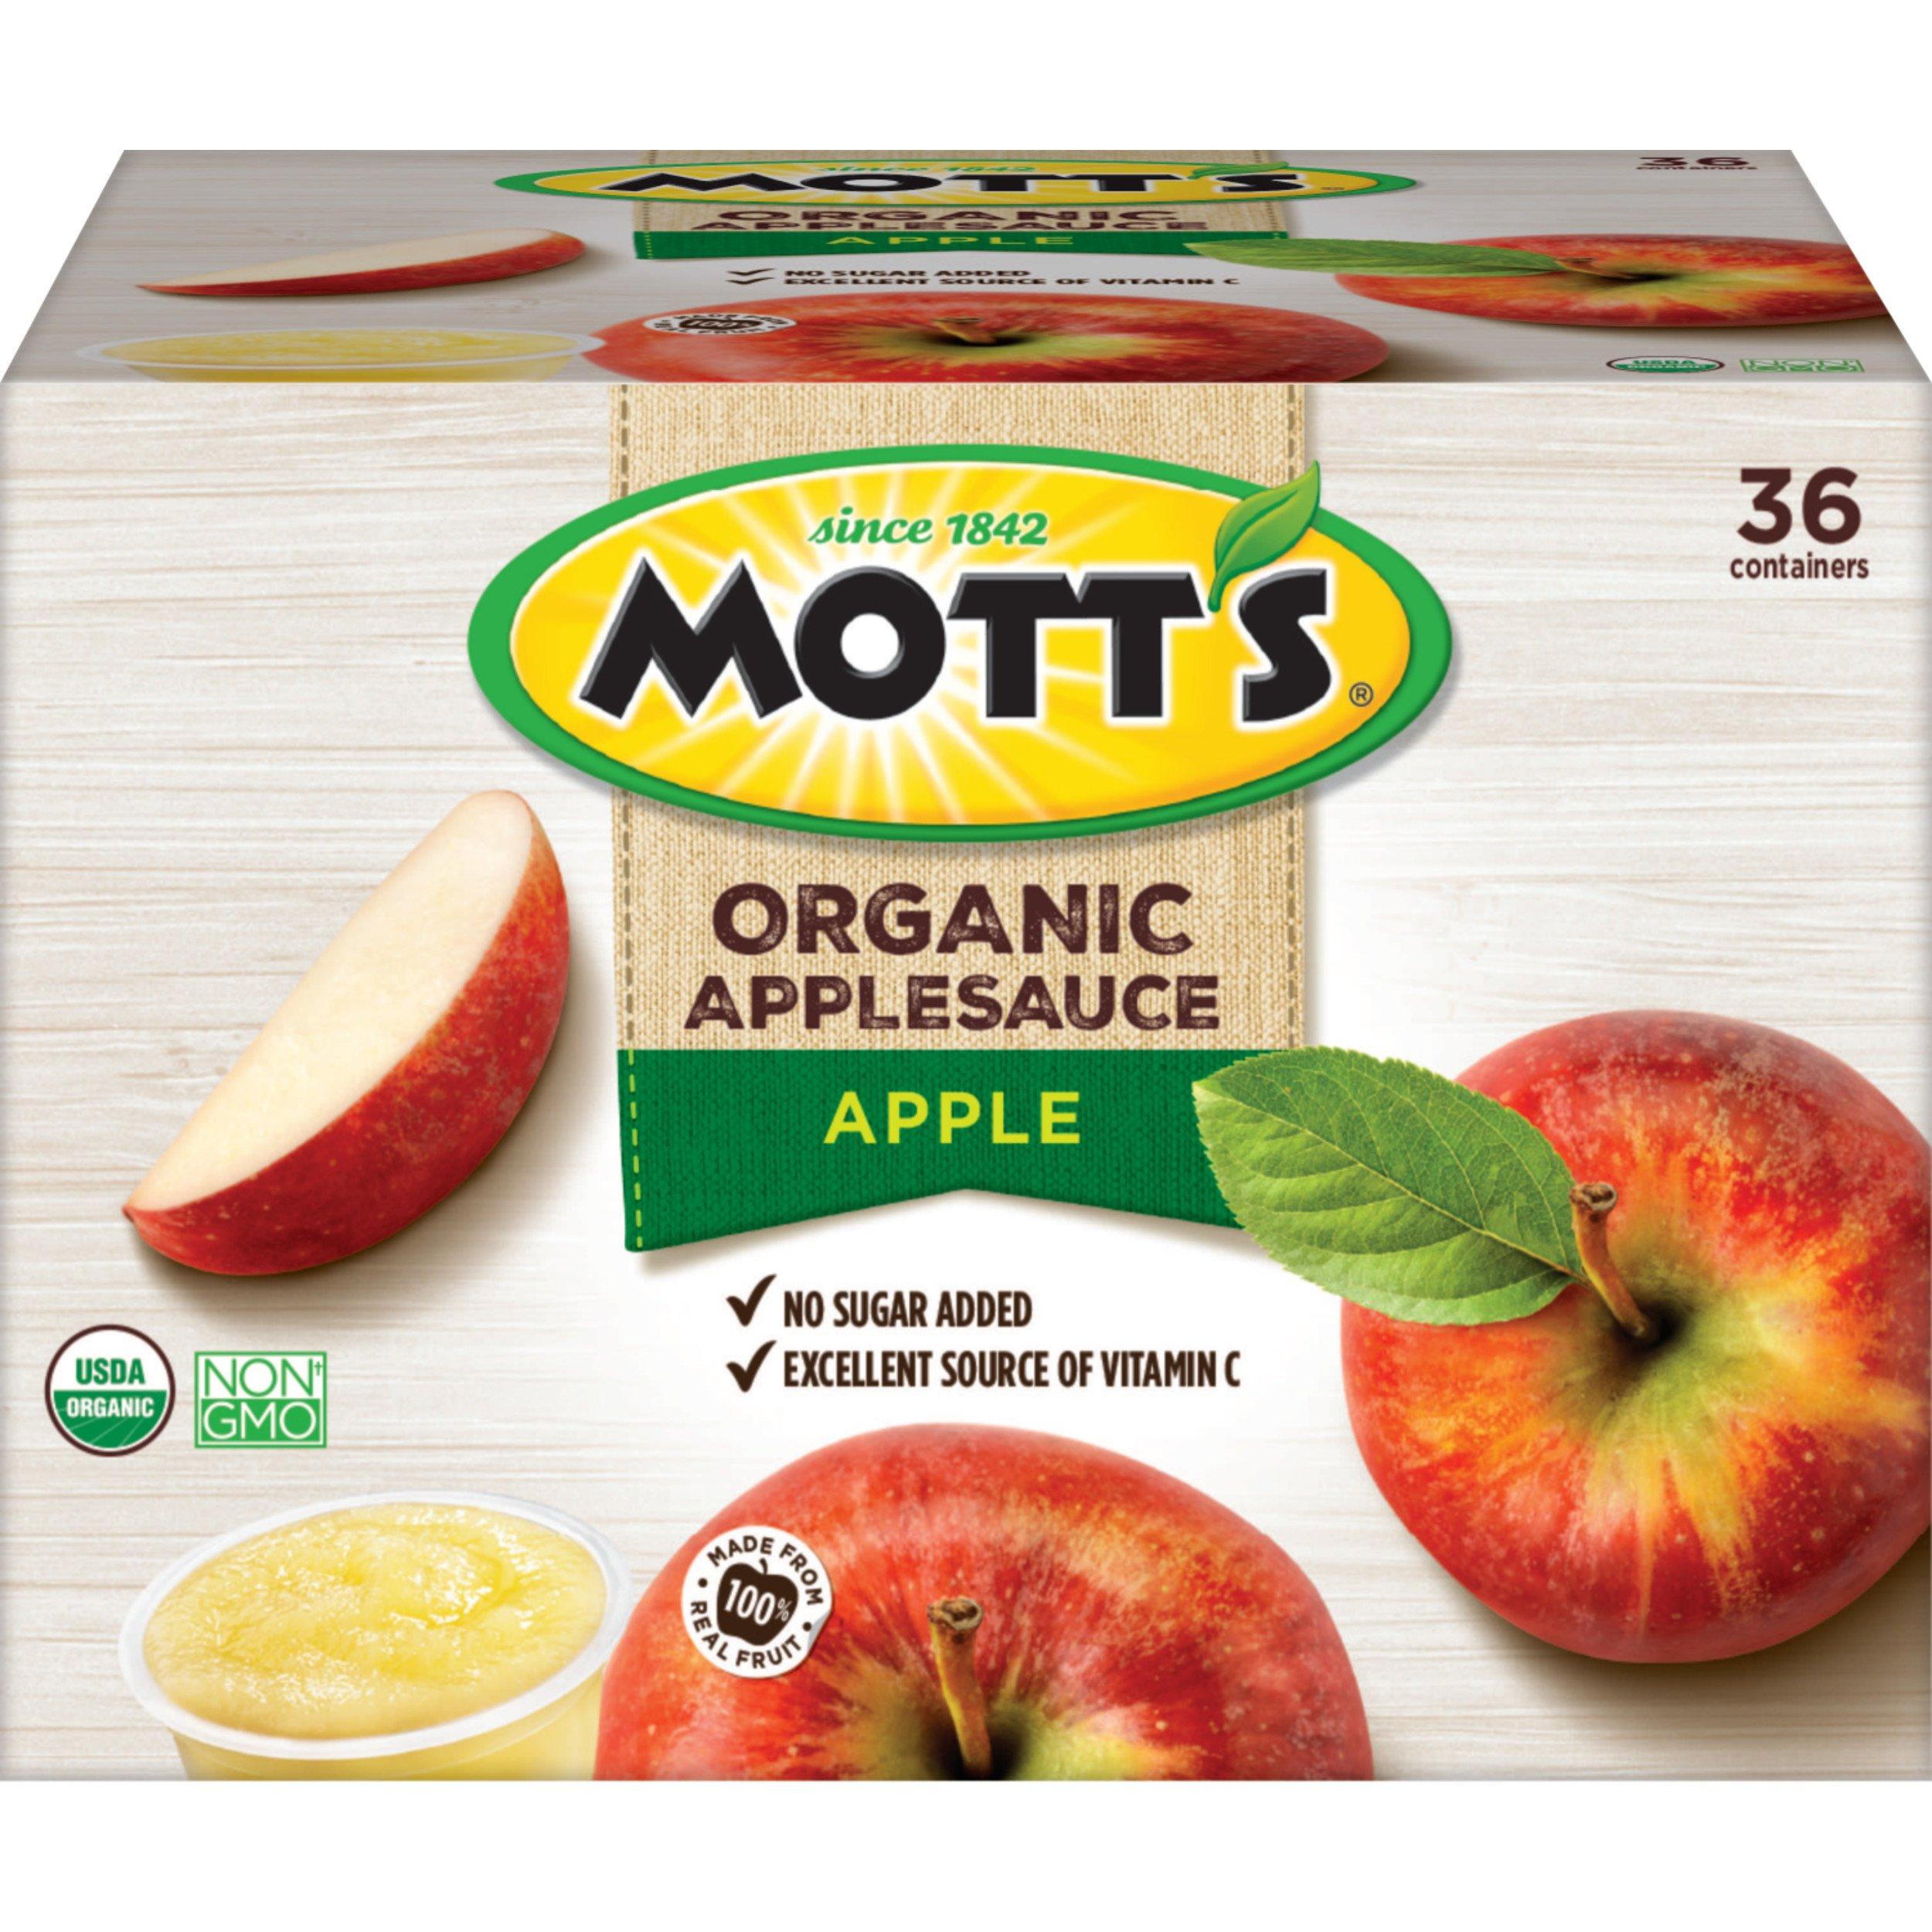 Mott's Organic Applesauce, 3.9 oz cups, 36 count by Mott's